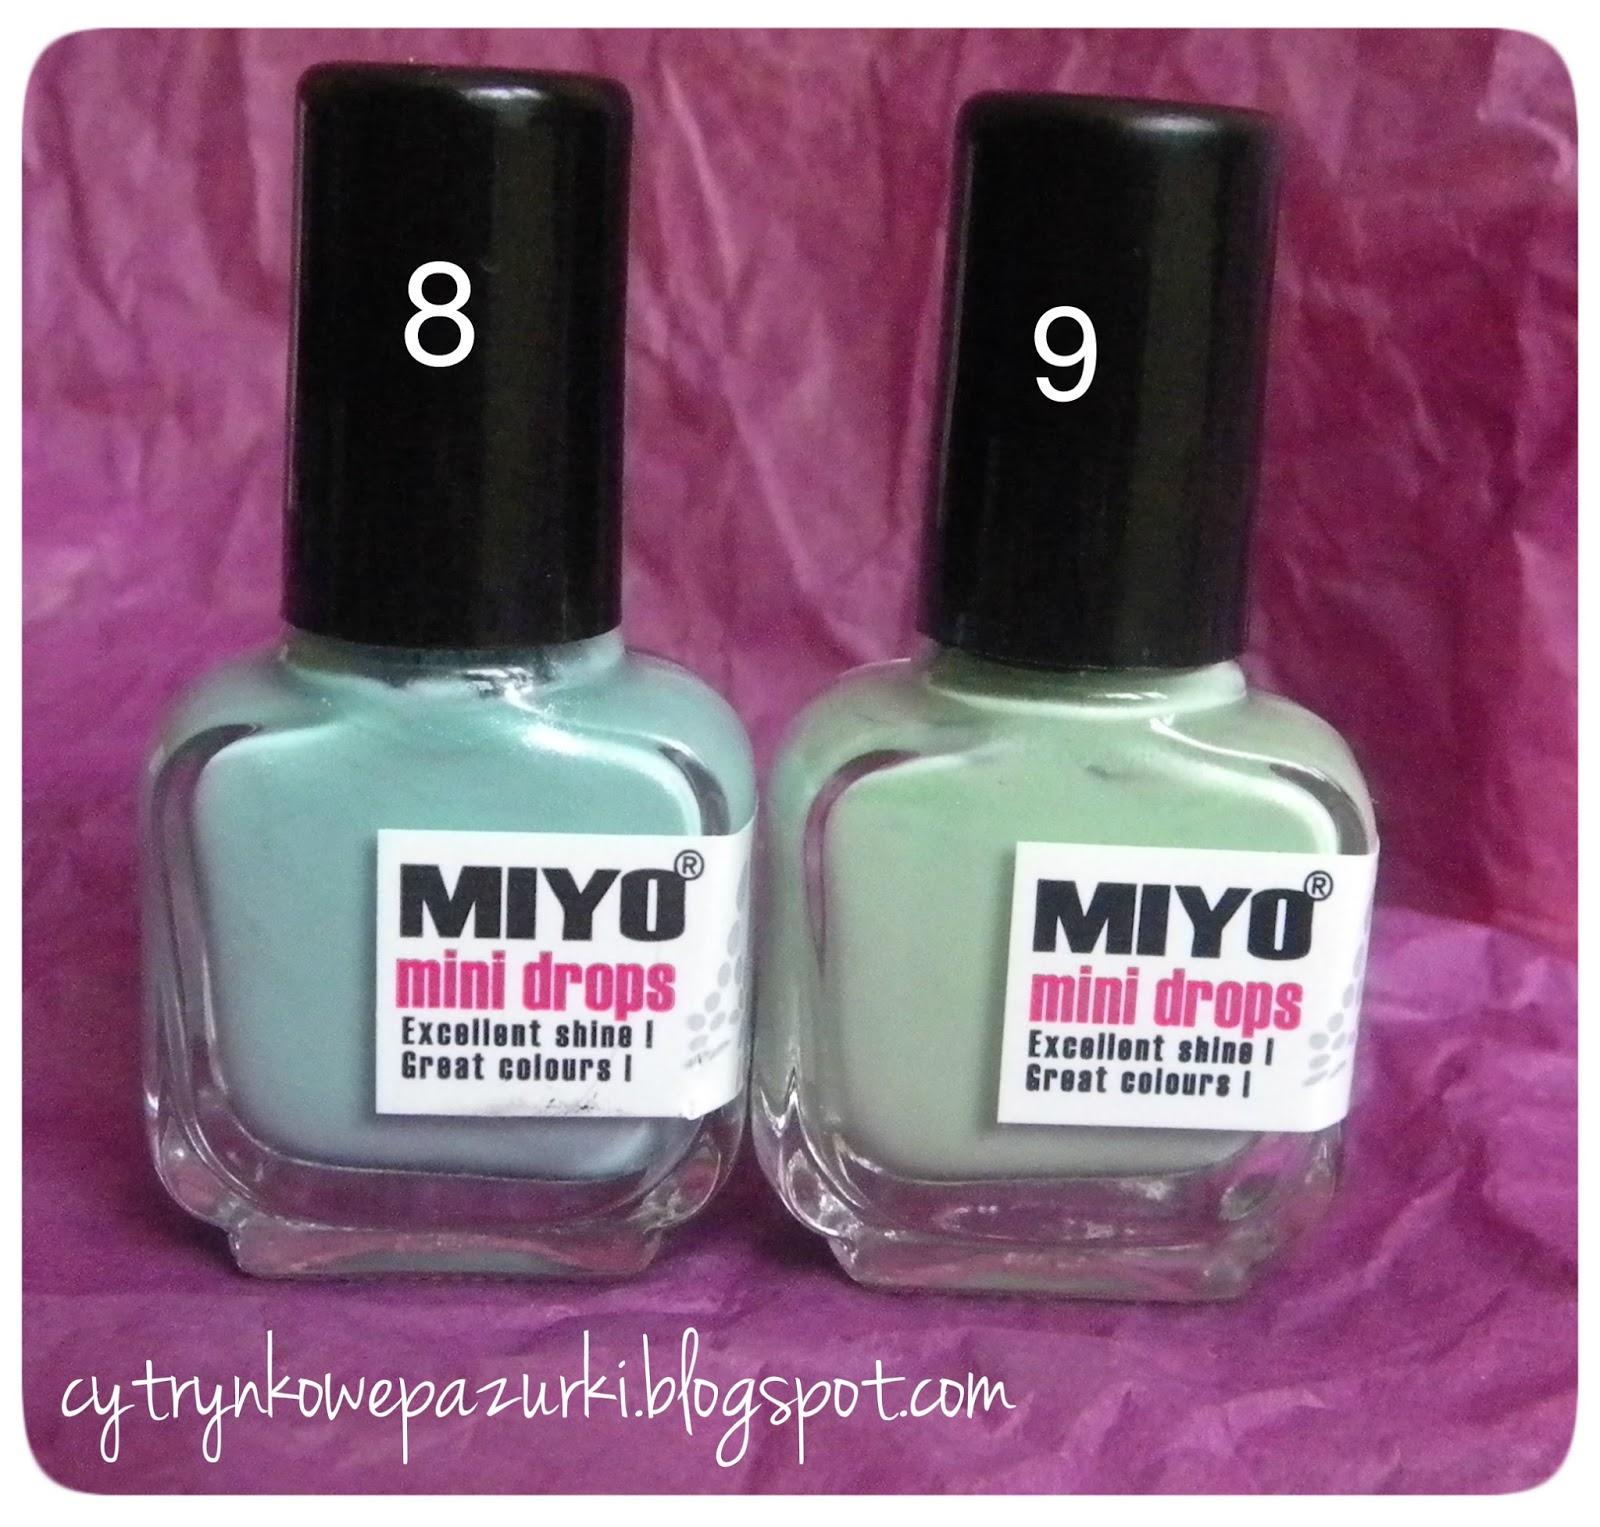 miyo mini drops